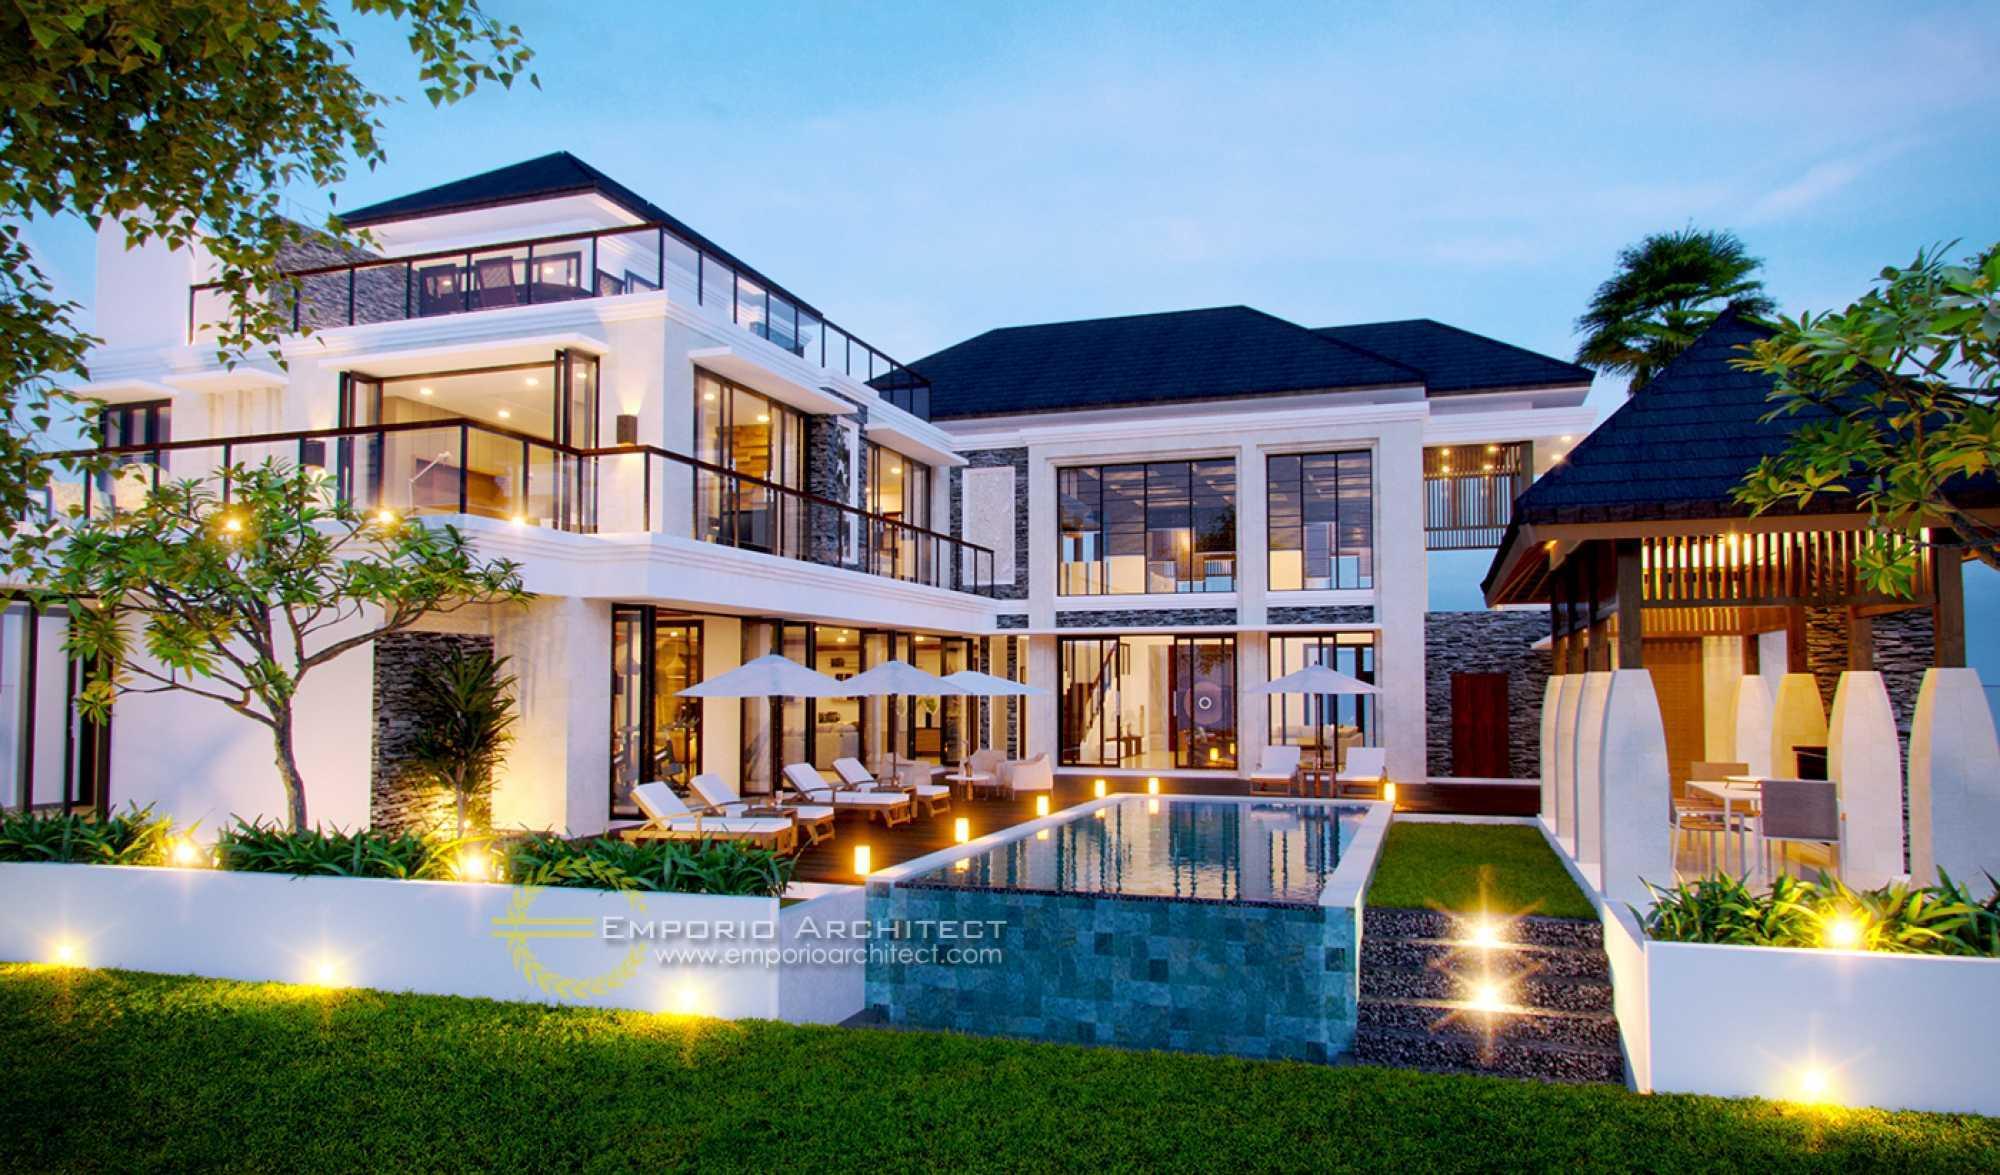 Emporio Architect Desain Rumah Villa Bali Tropis 242 @ Bogor, Jawa Barat Bogor, Jawa Barat, Indonesia Bogor, Jawa Barat, Indonesia Emporio-Architect-Desain-Rumah-Villa-Bali-Tropis-242-Bogor-Jawa-Barat  73275